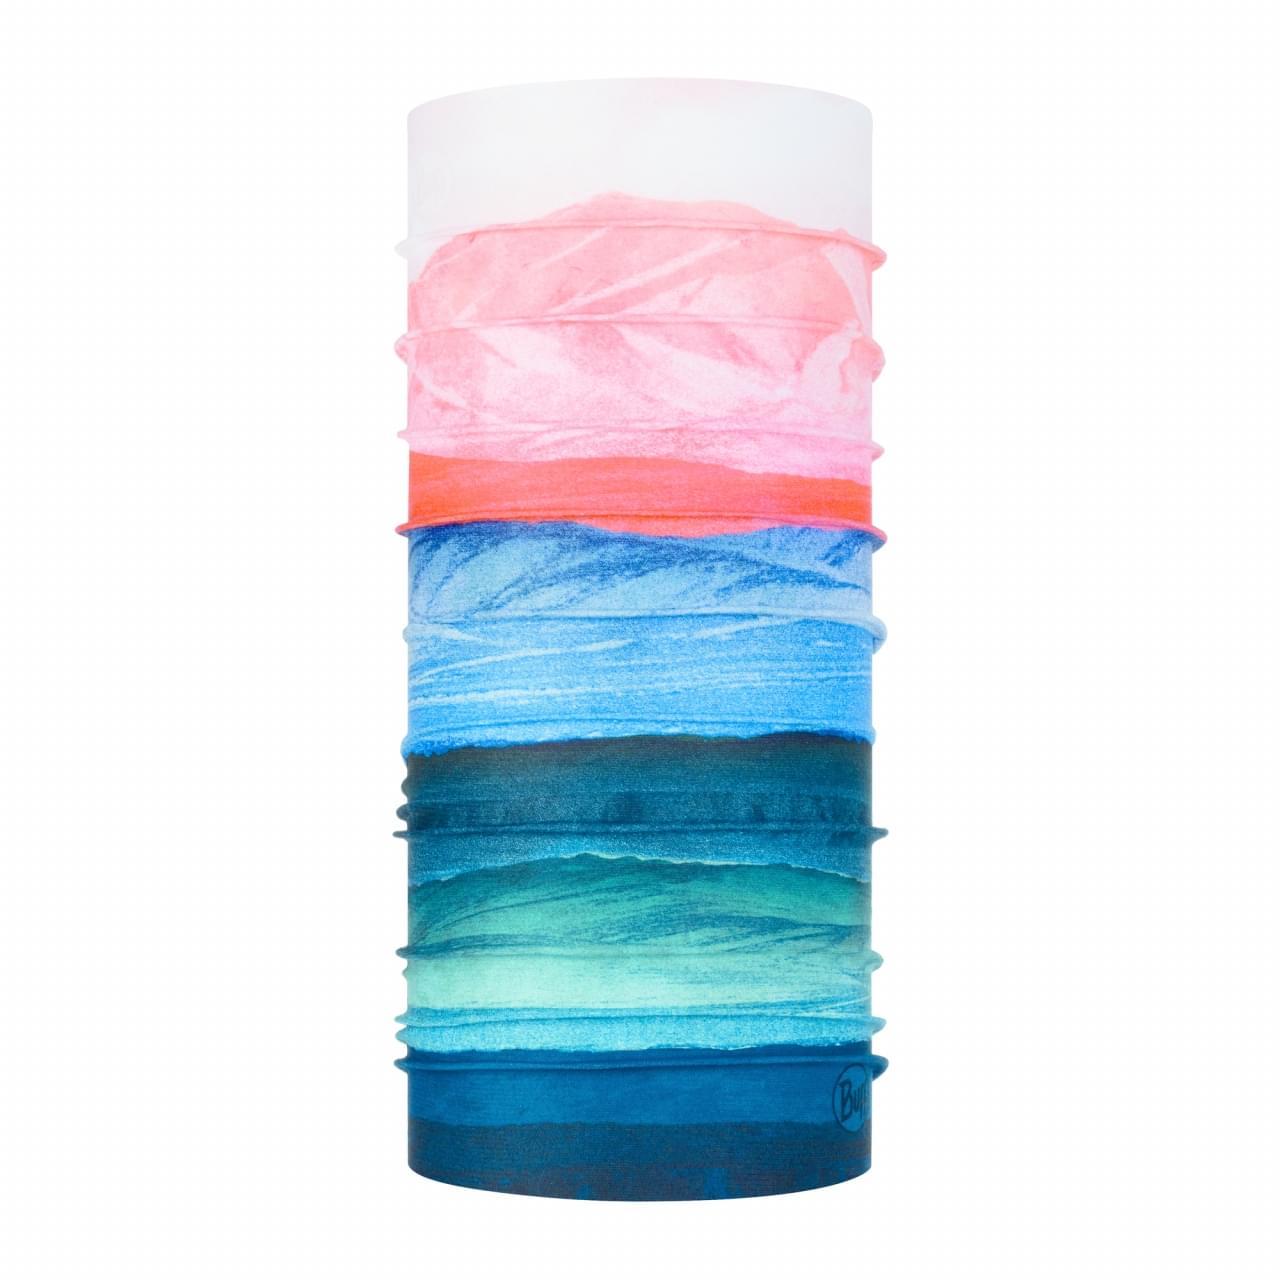 Buff CoolNet UV+ Insect Shield Multicolor